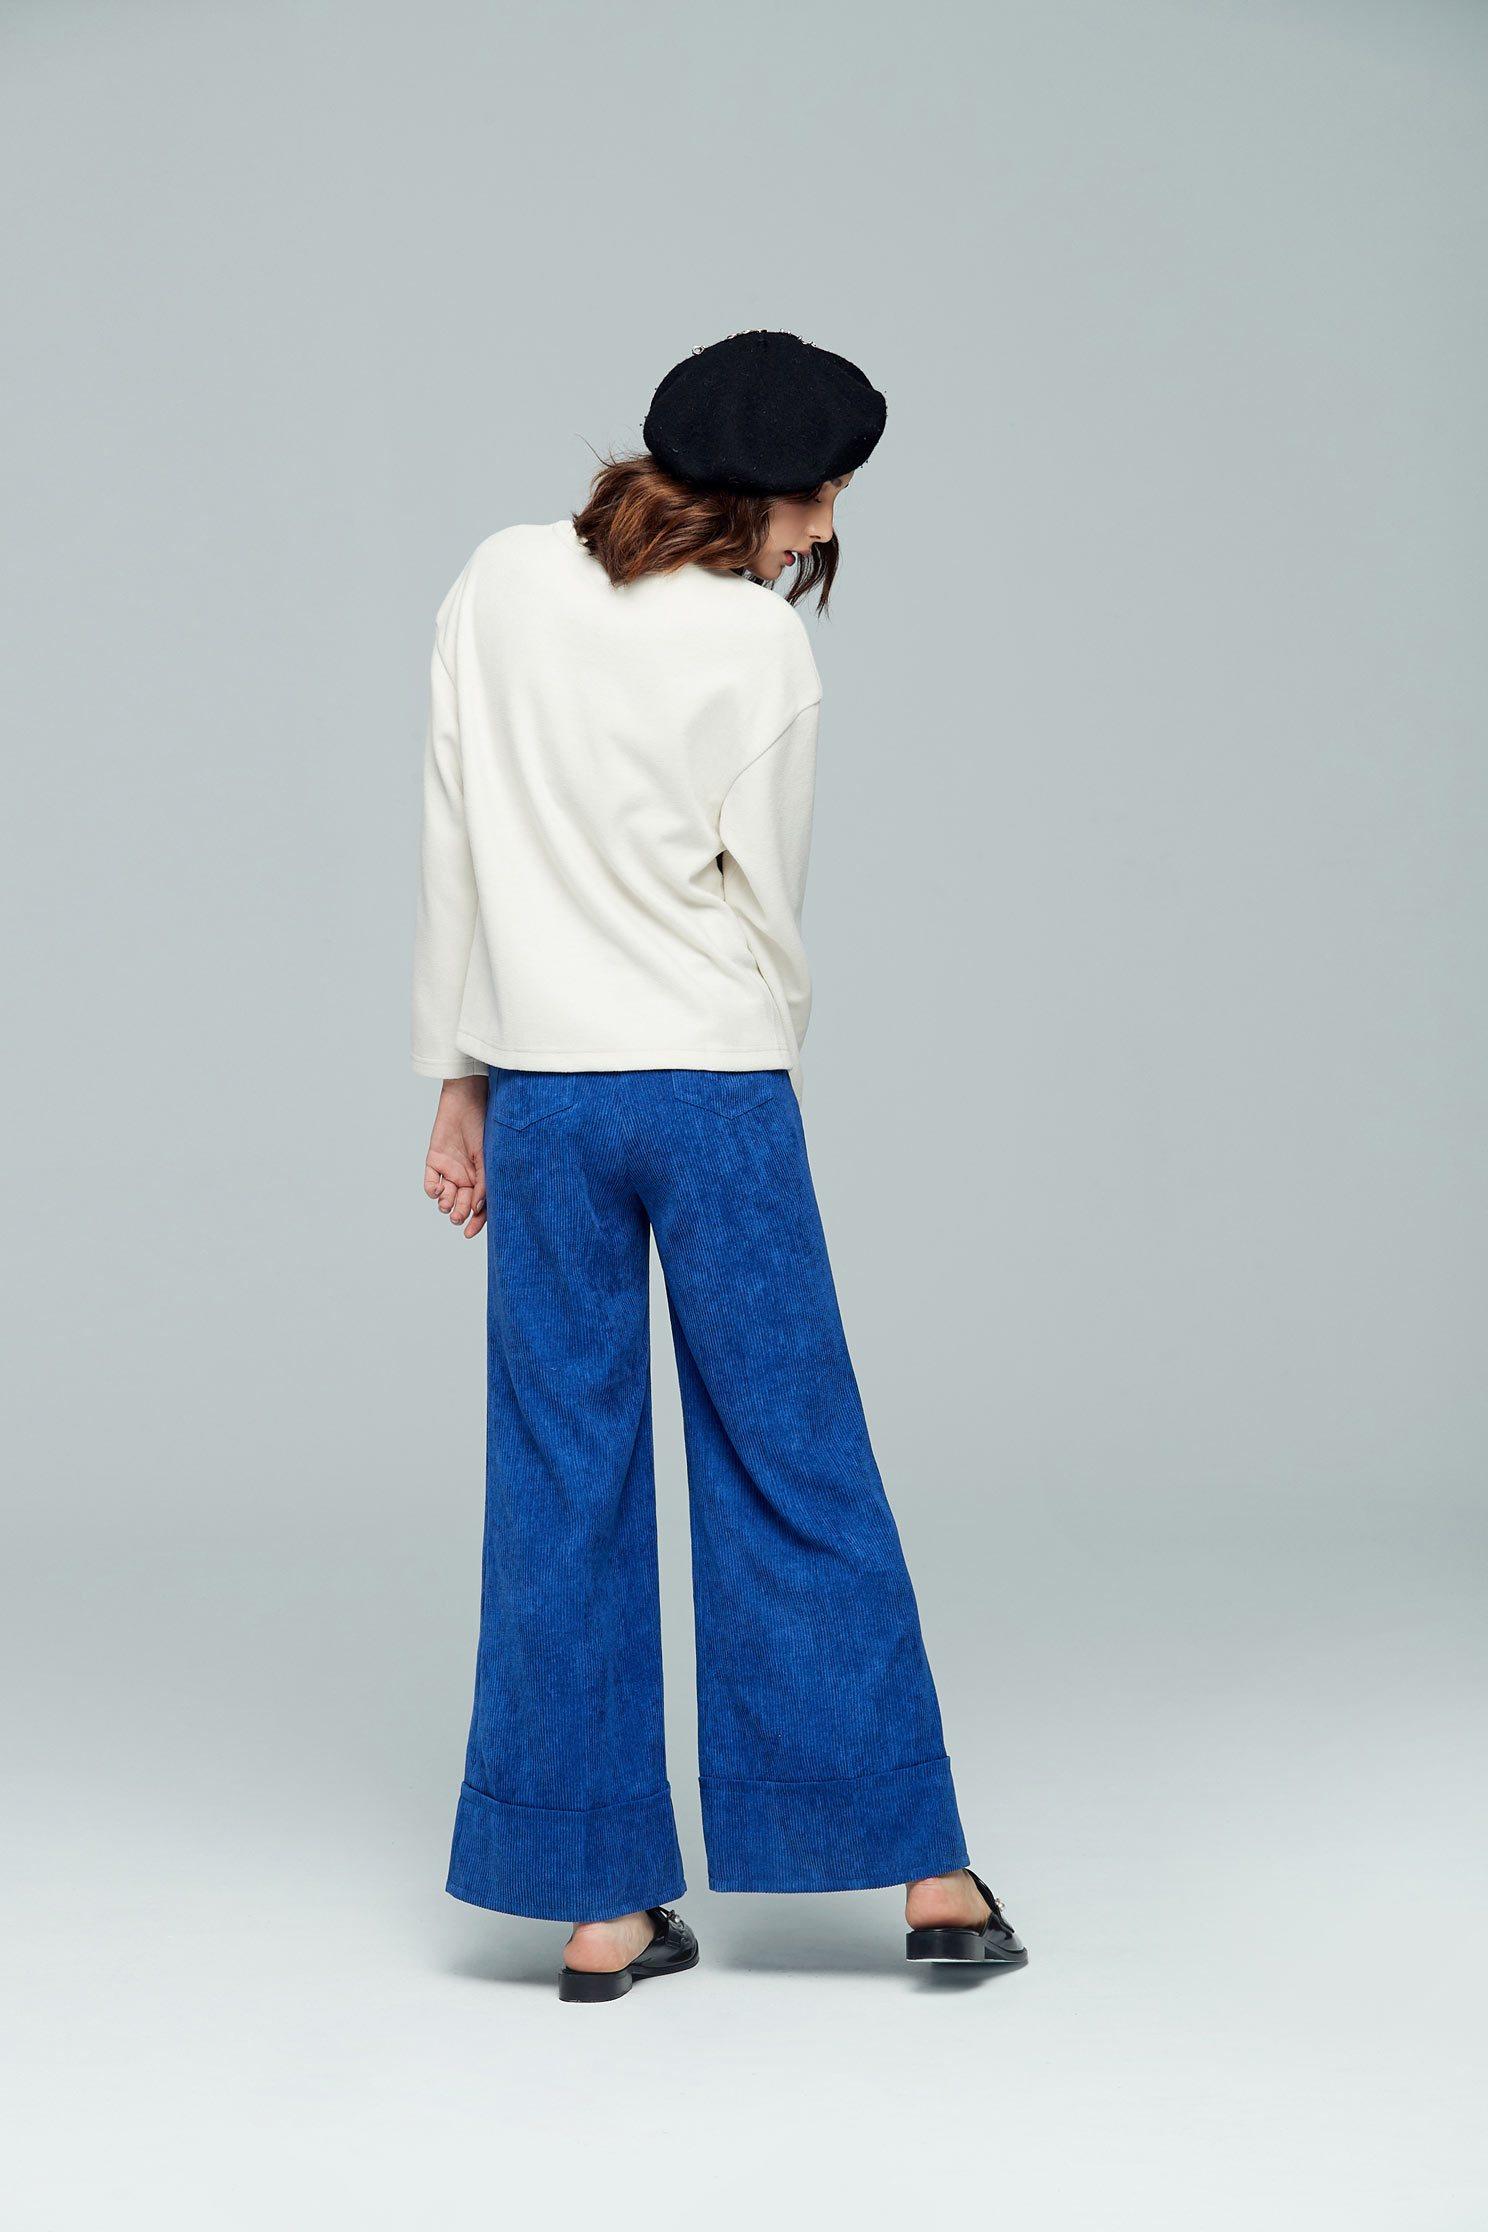 Grace culottes,culottespants,pants,trousers,pants,wasthin